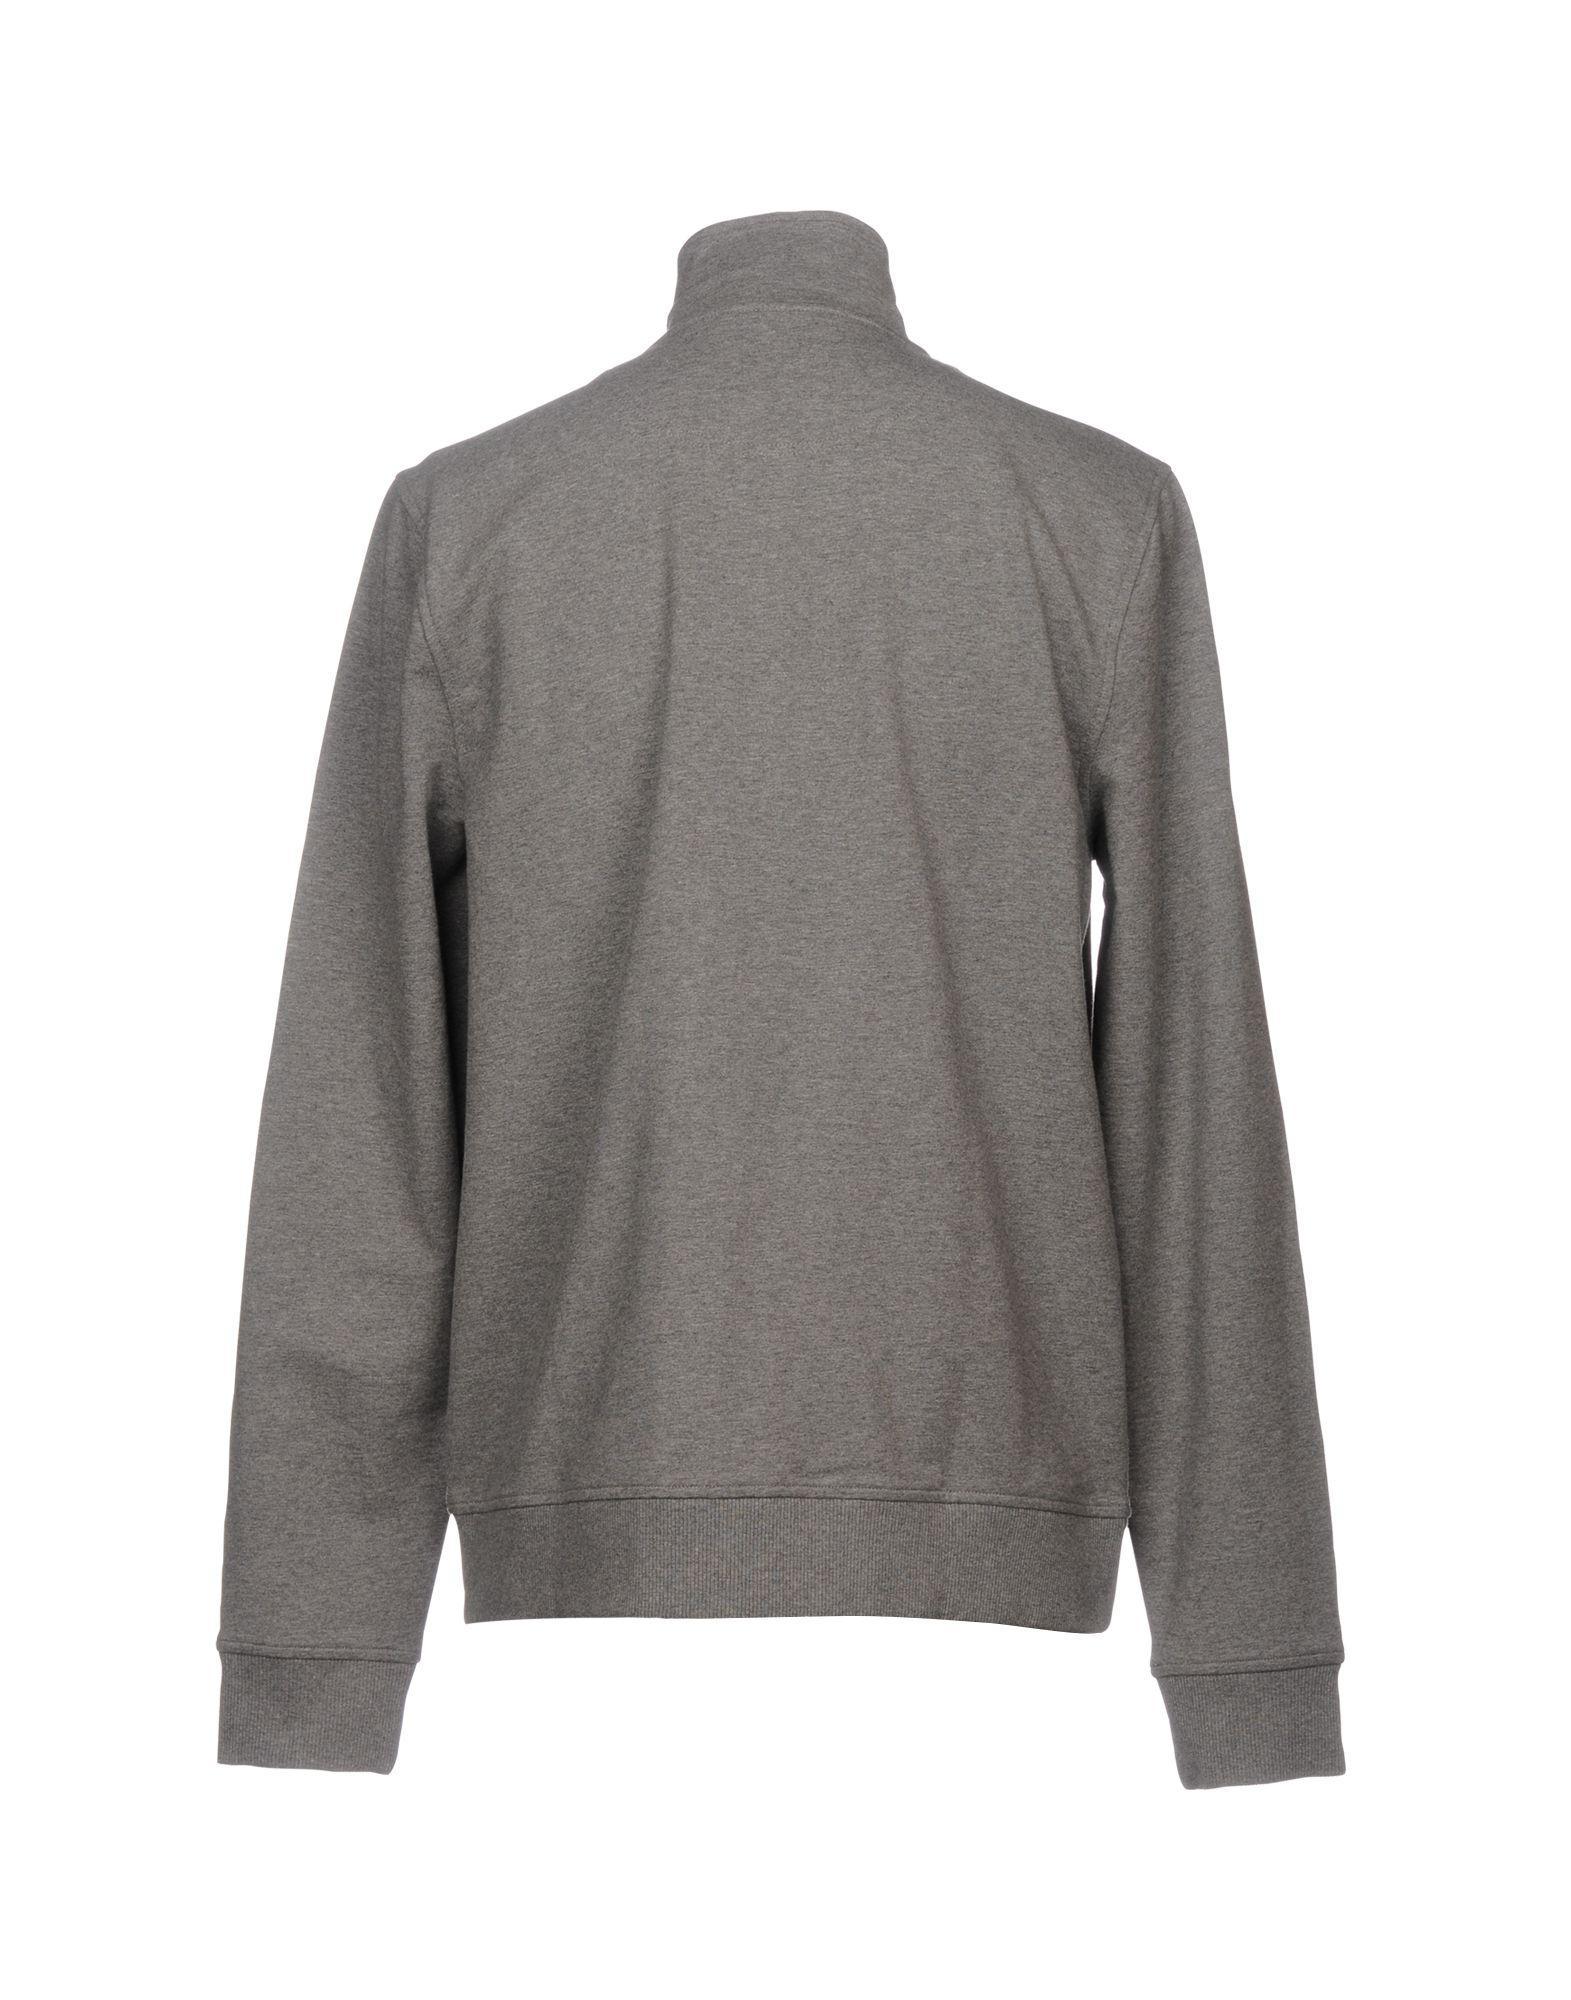 3274965847b56 Michael Kors Sweatshirt in Gray for Men - Lyst